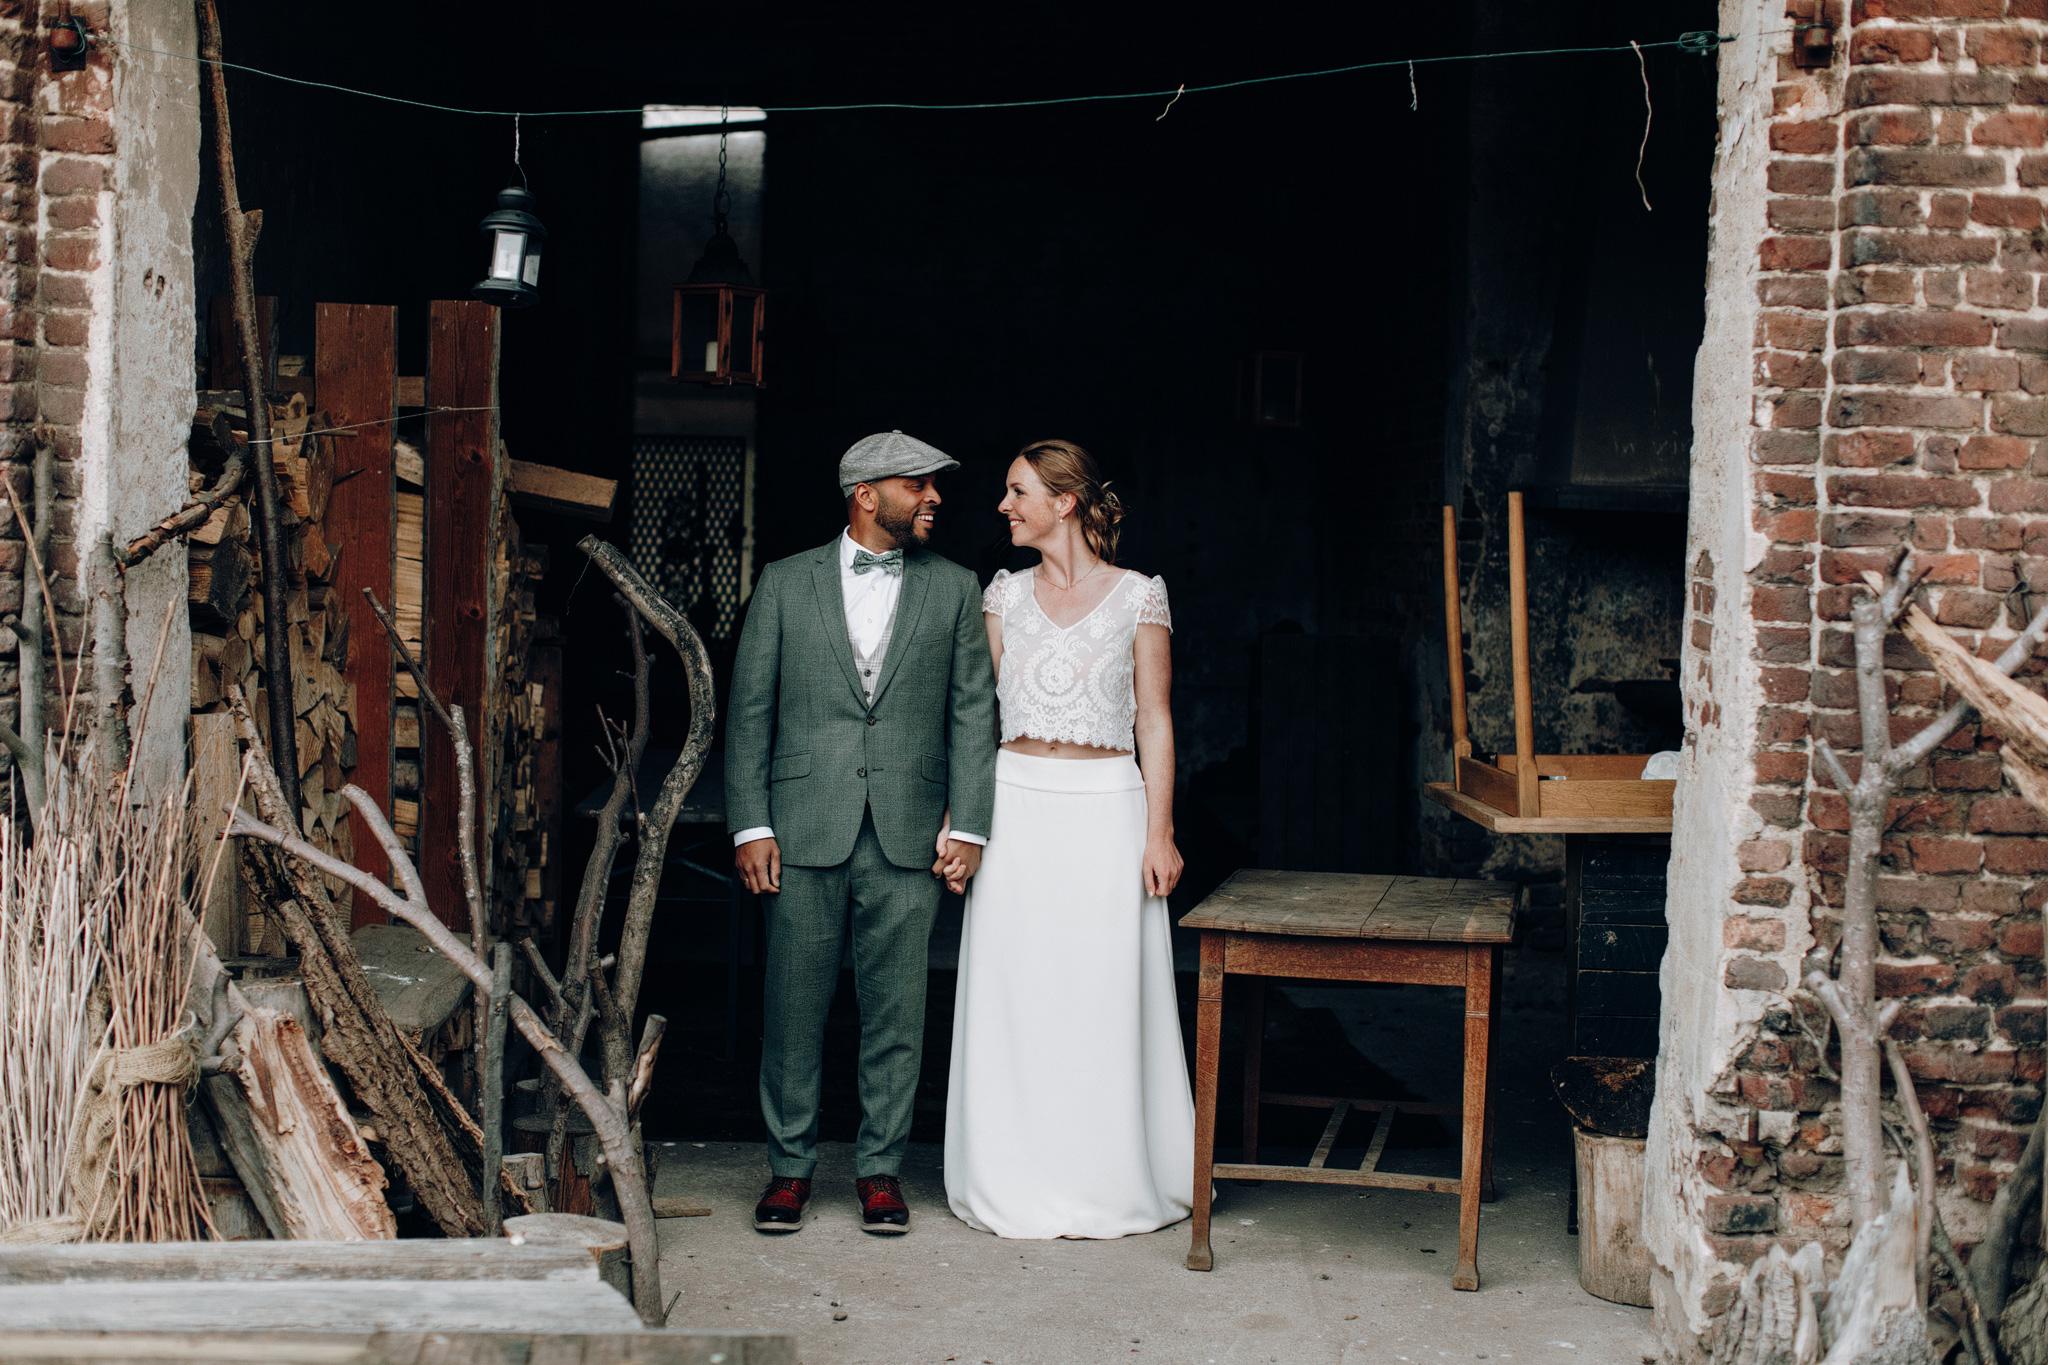 Bruid en bruidegom trouwreportage Kloster Graefenthal